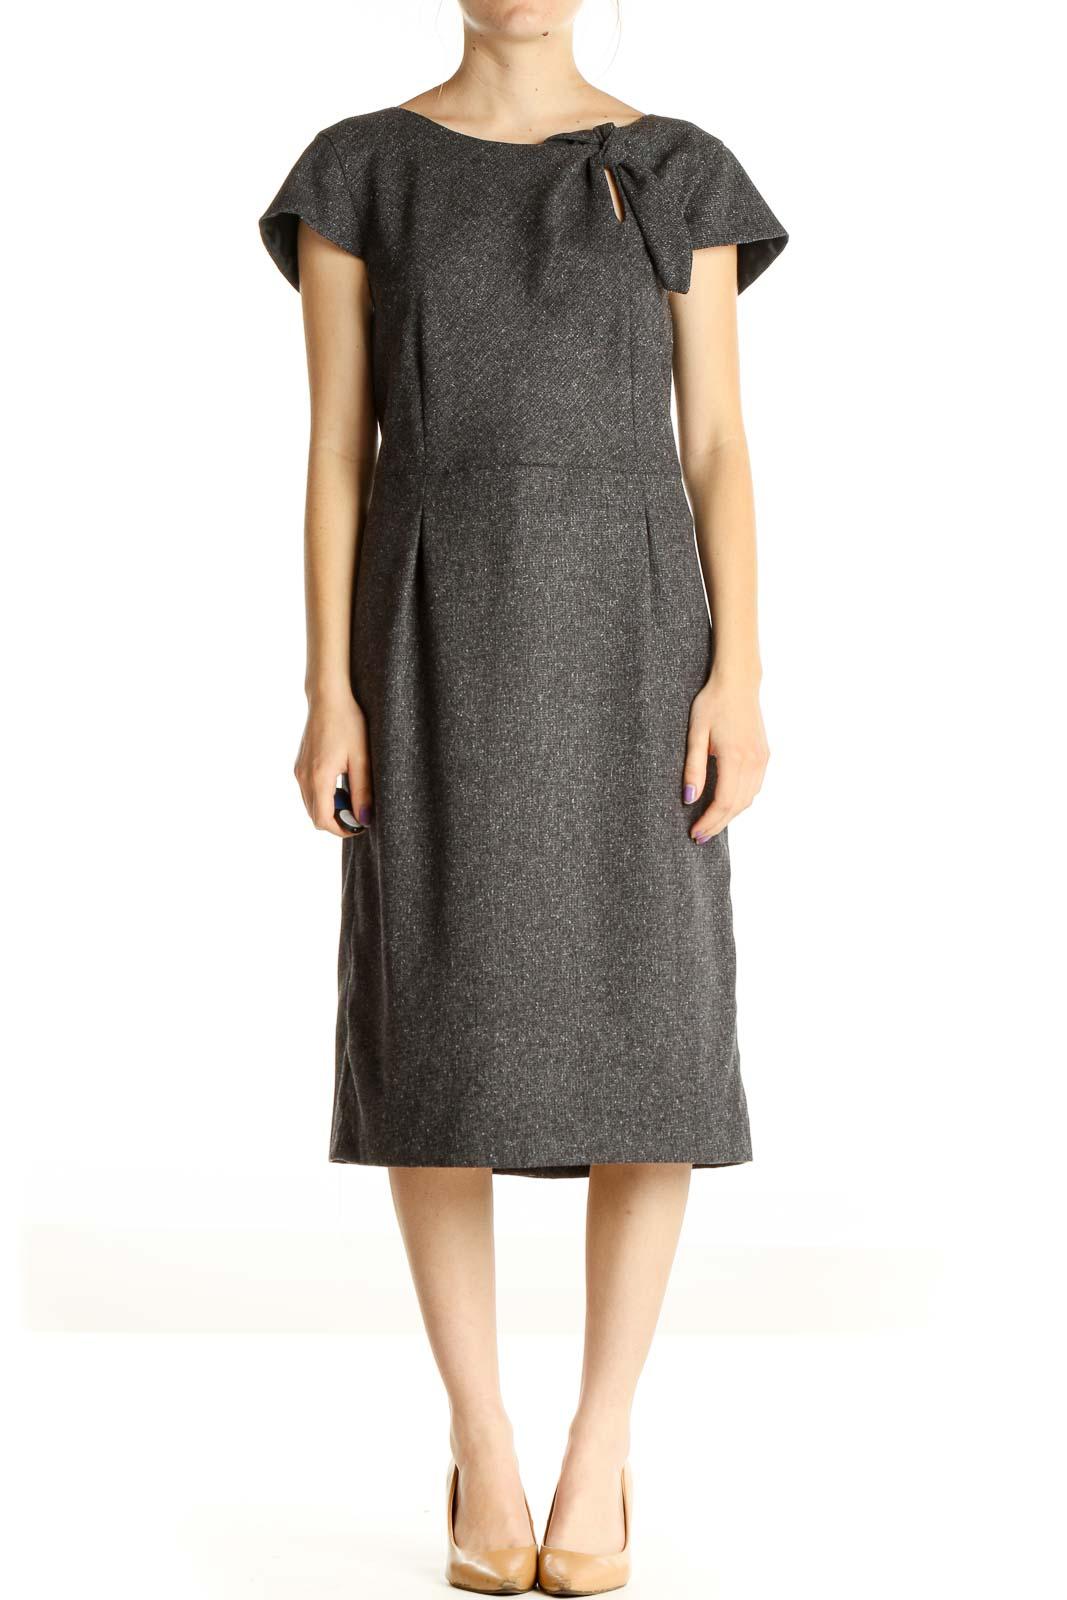 Gray Work Dress Front